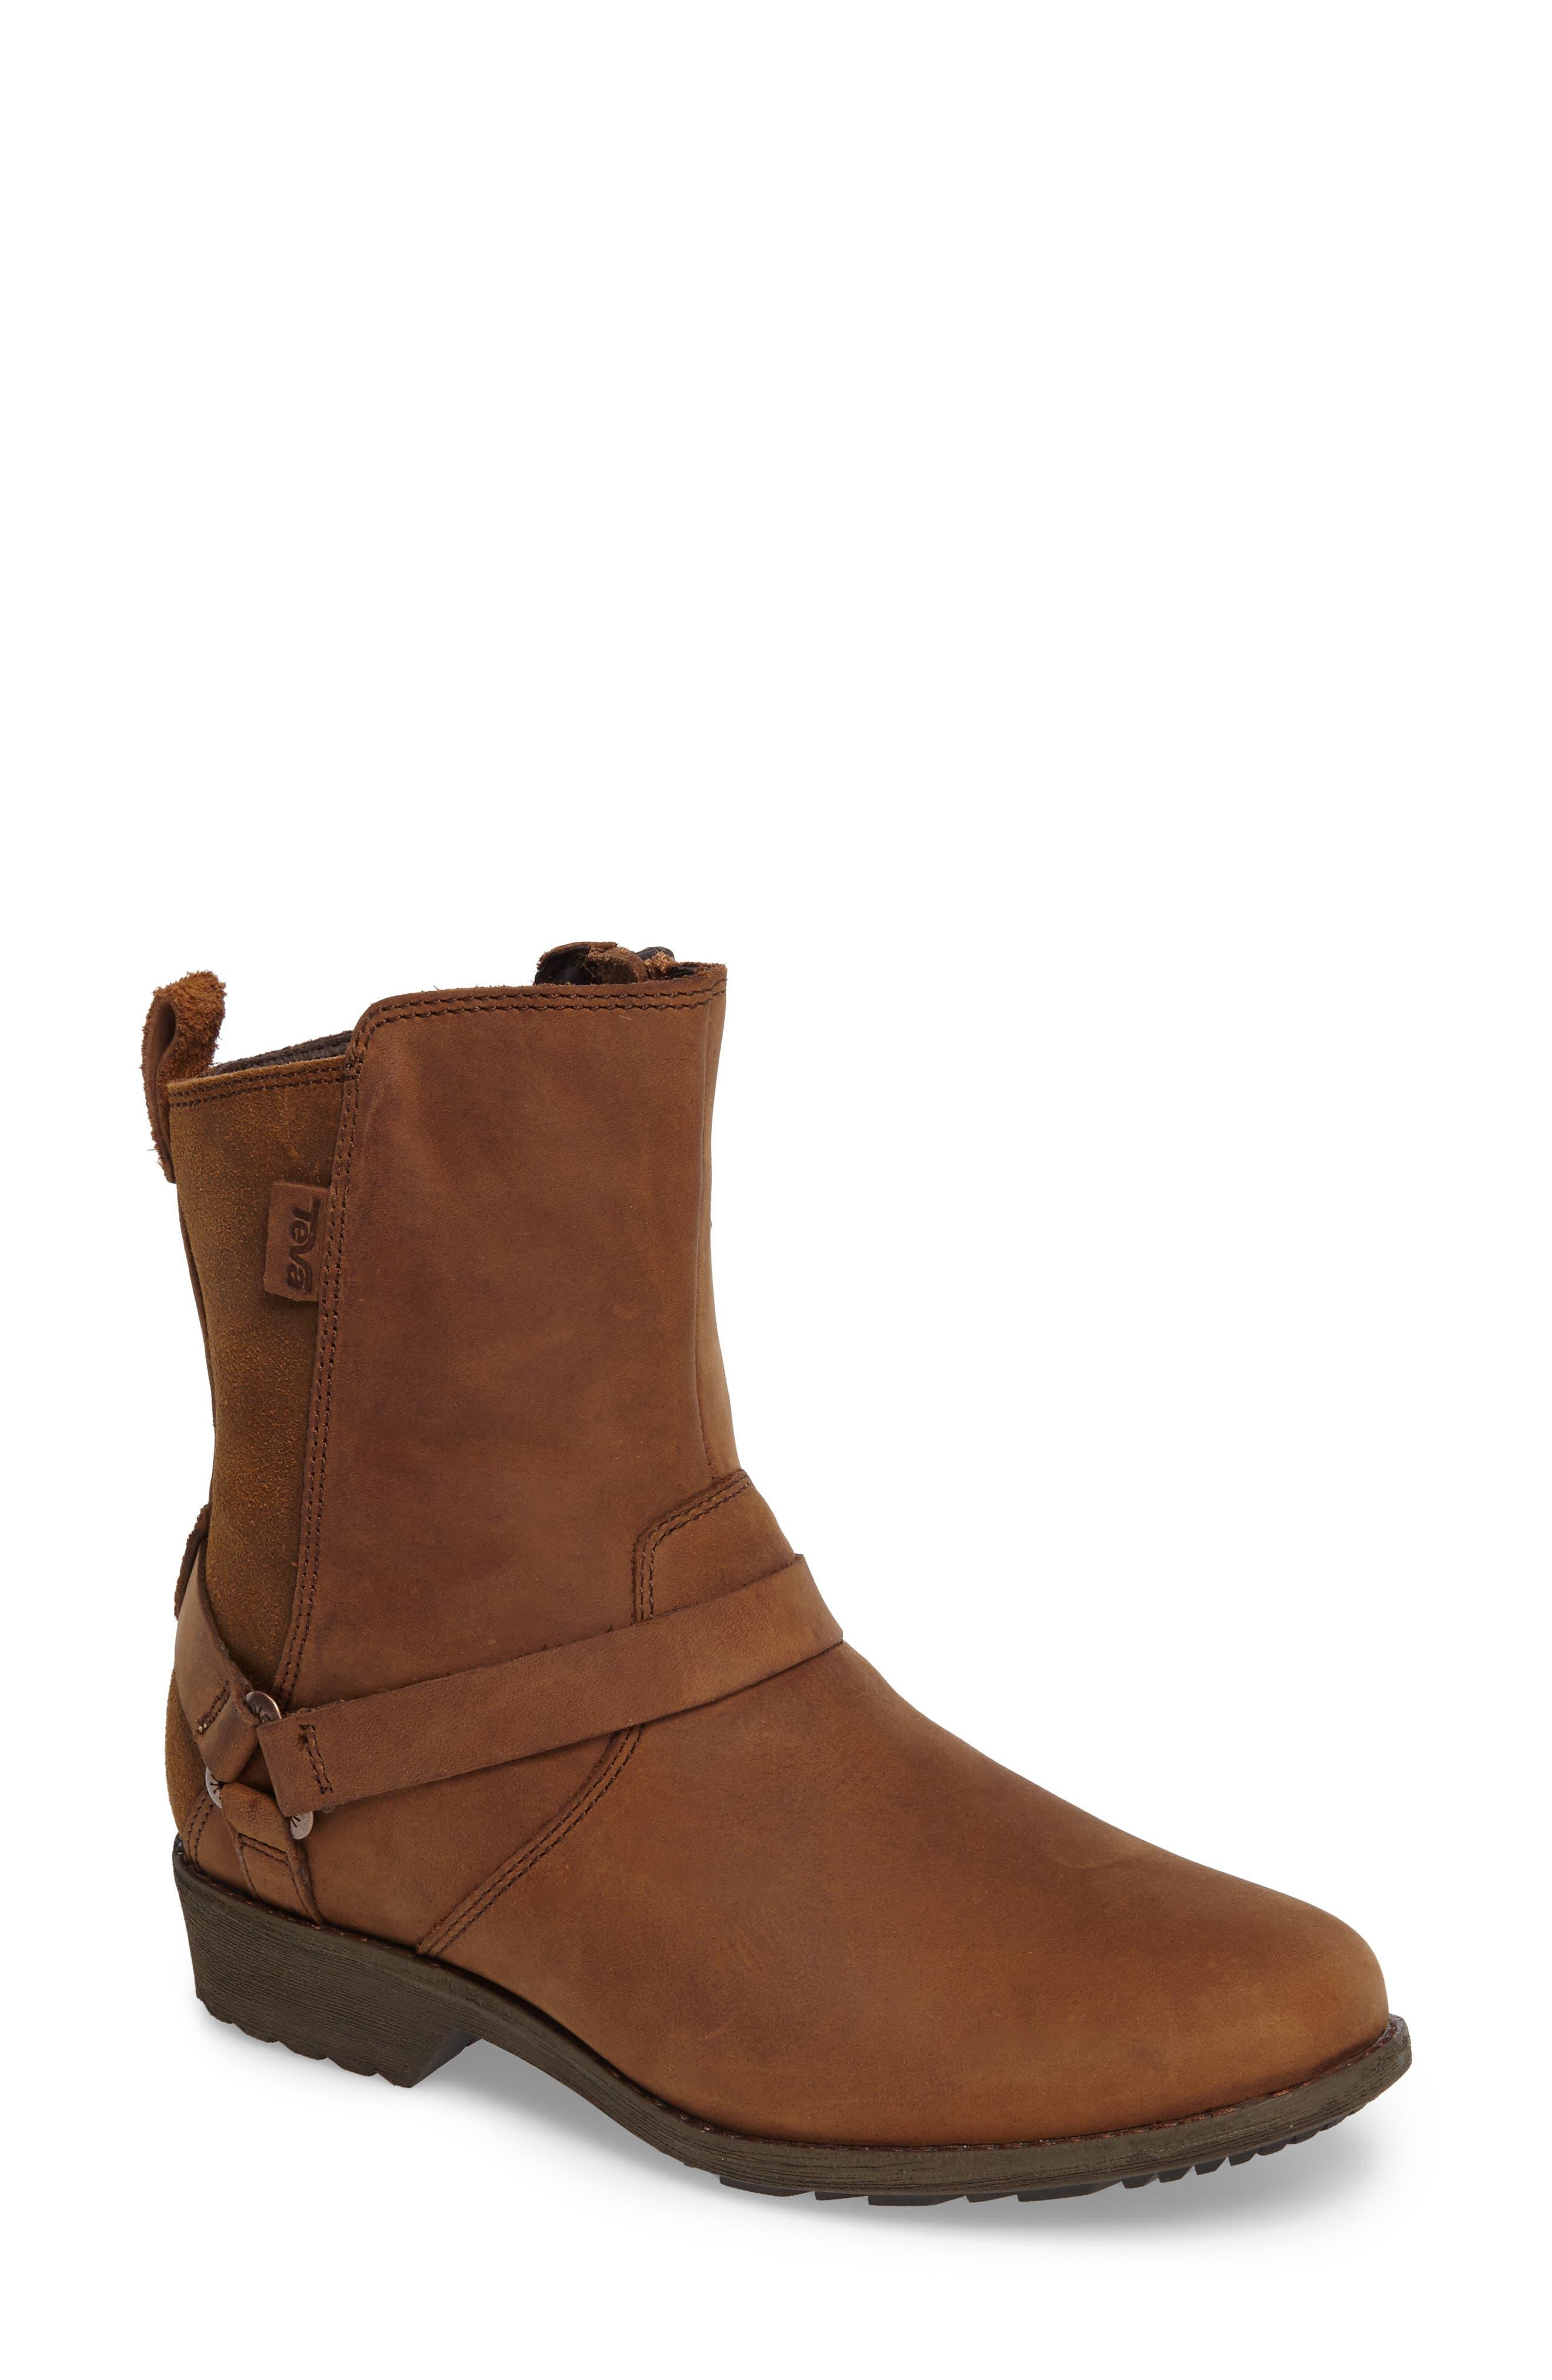 Dina La Vina Dos Waterproof Boot,                         Main,                         color, Bison Leather